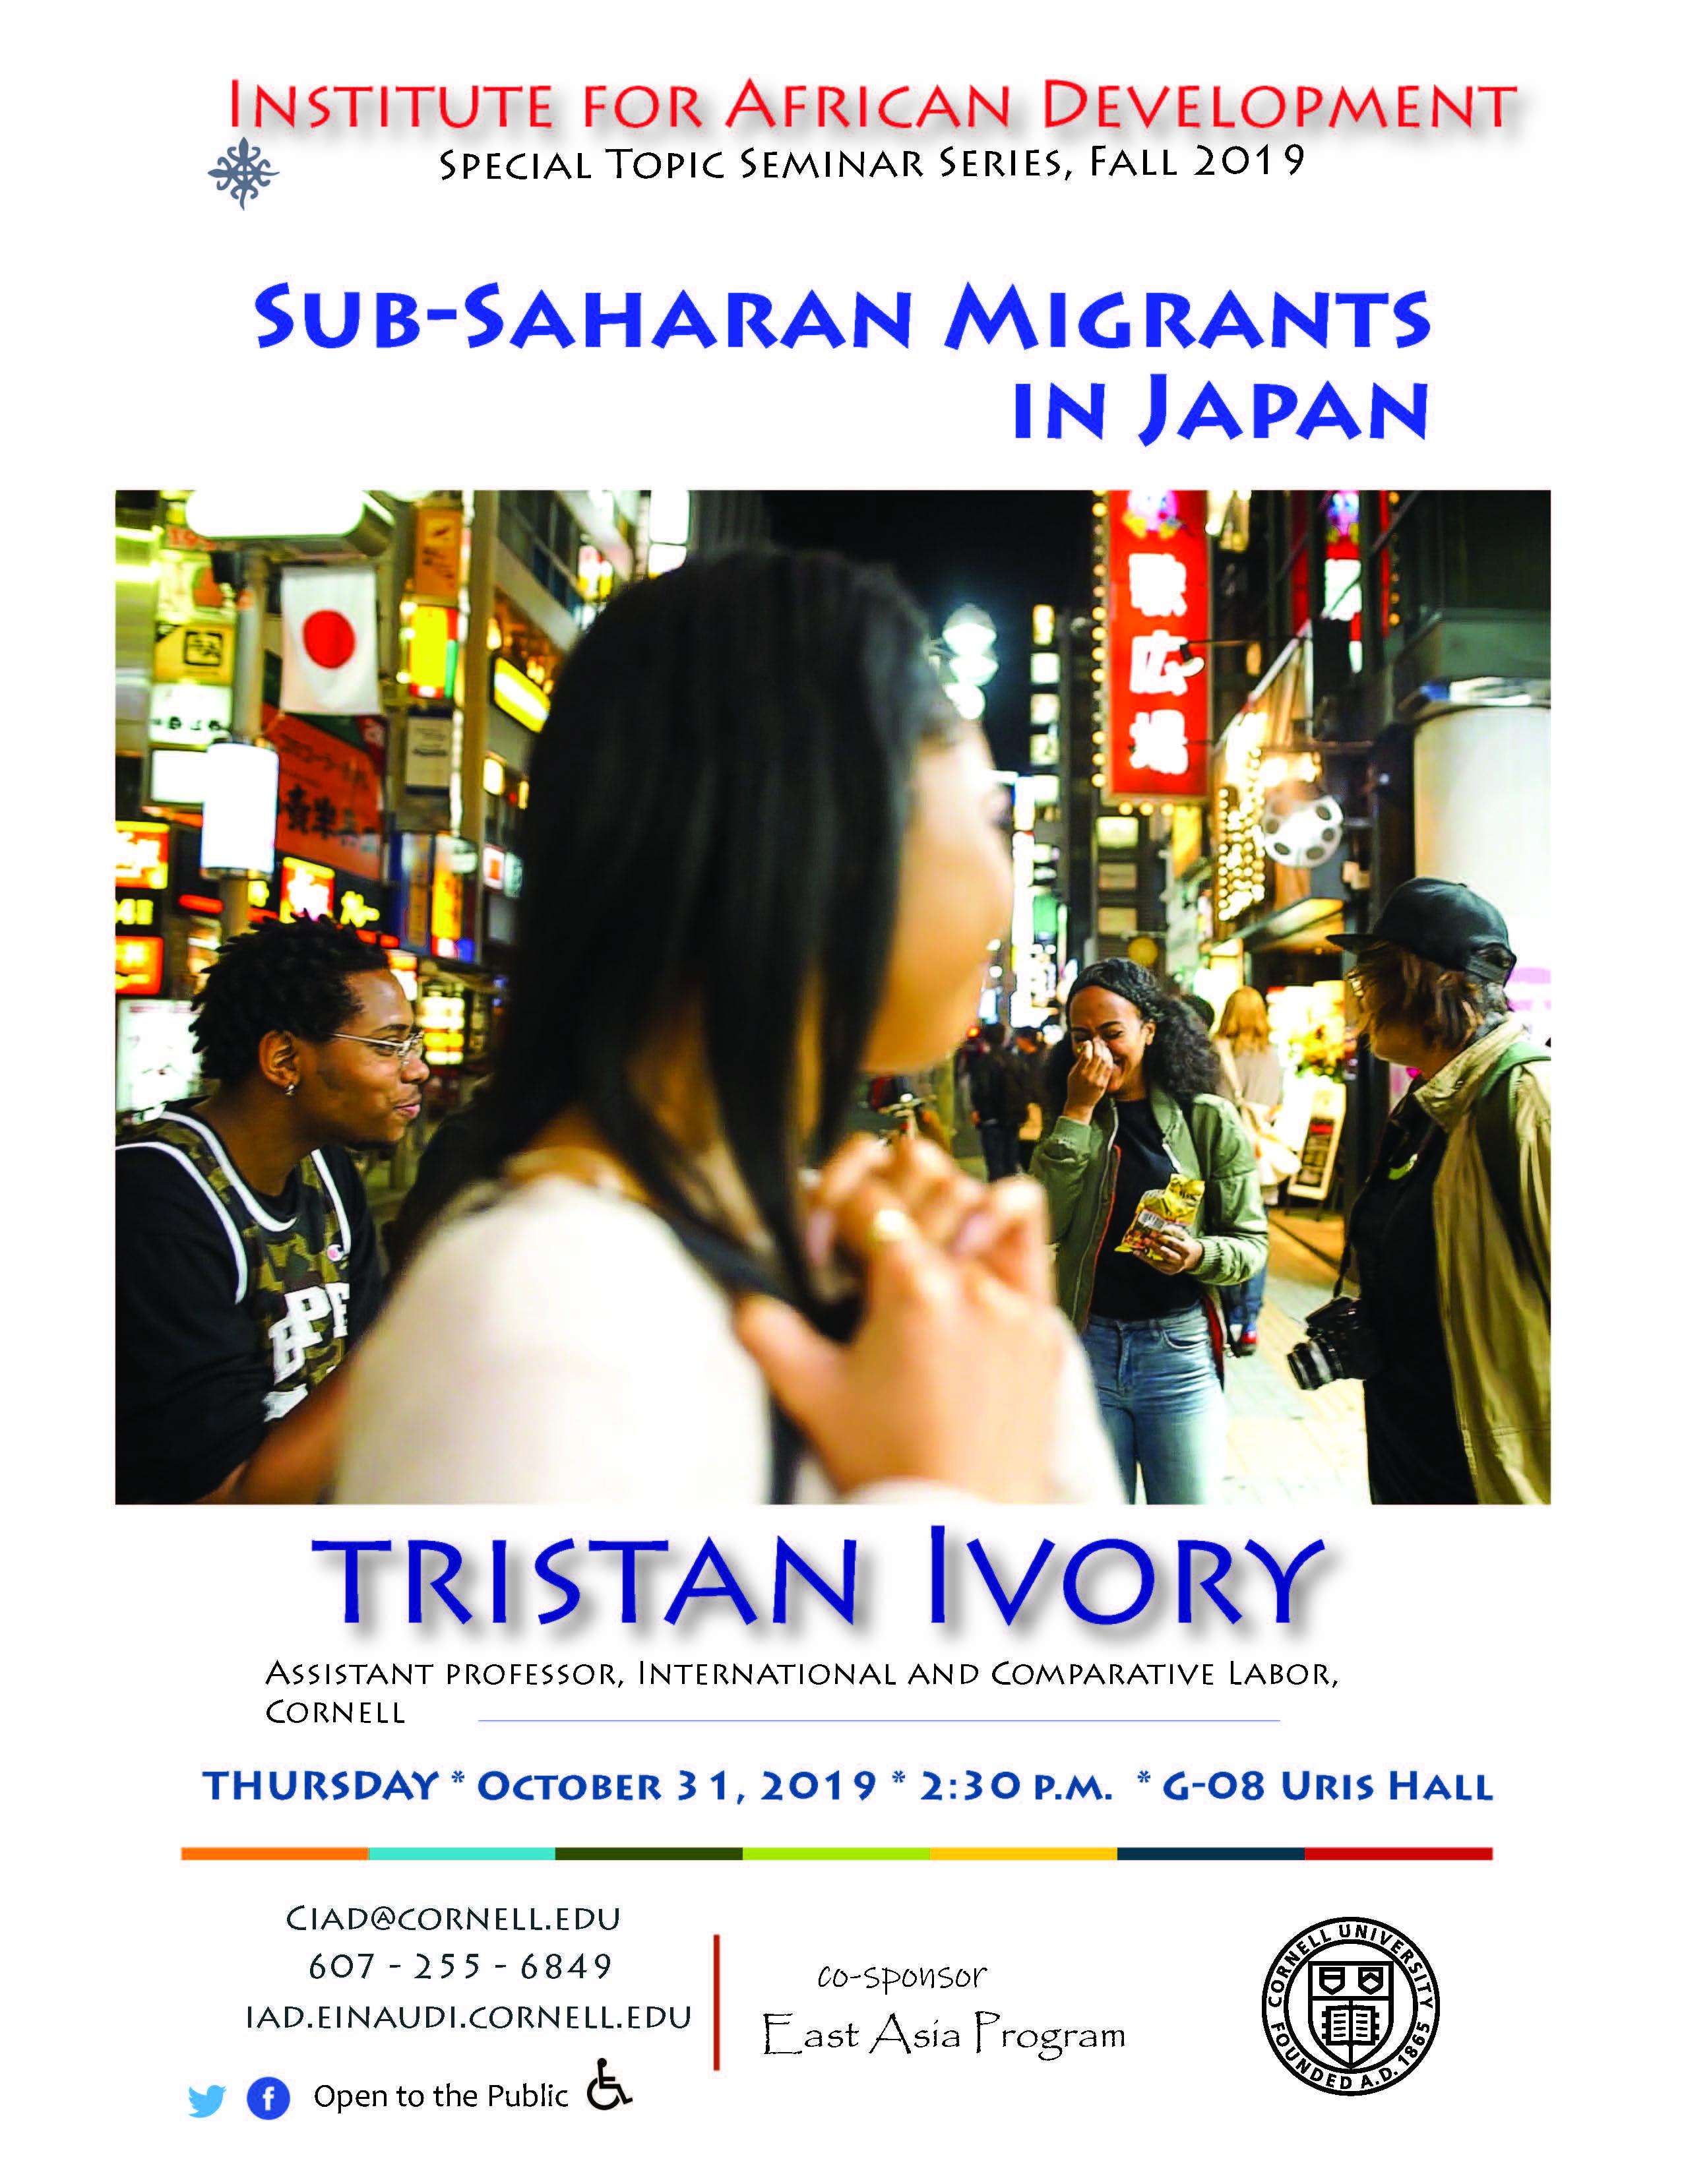 Sub-Saharan Migrants in Japan